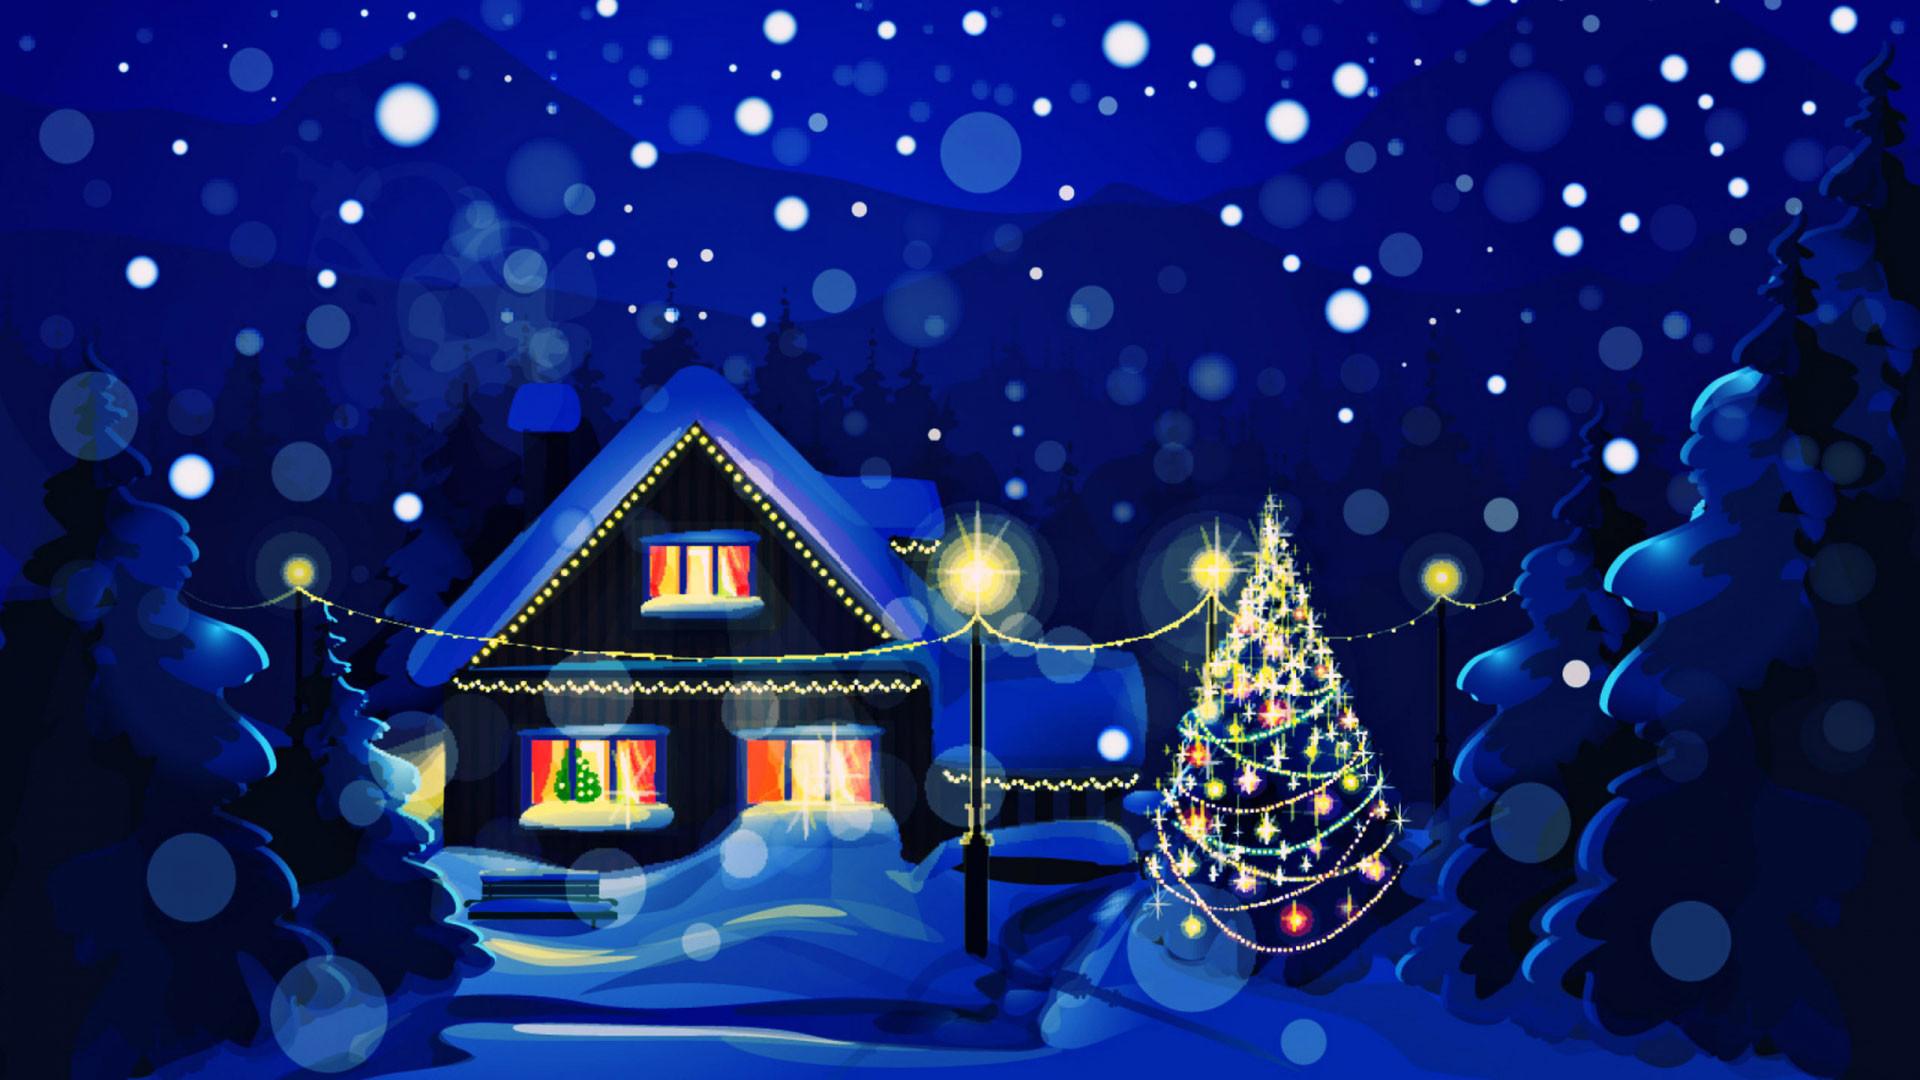 hd pics photos christmas christmas winter night blue desktop background  wallpaper